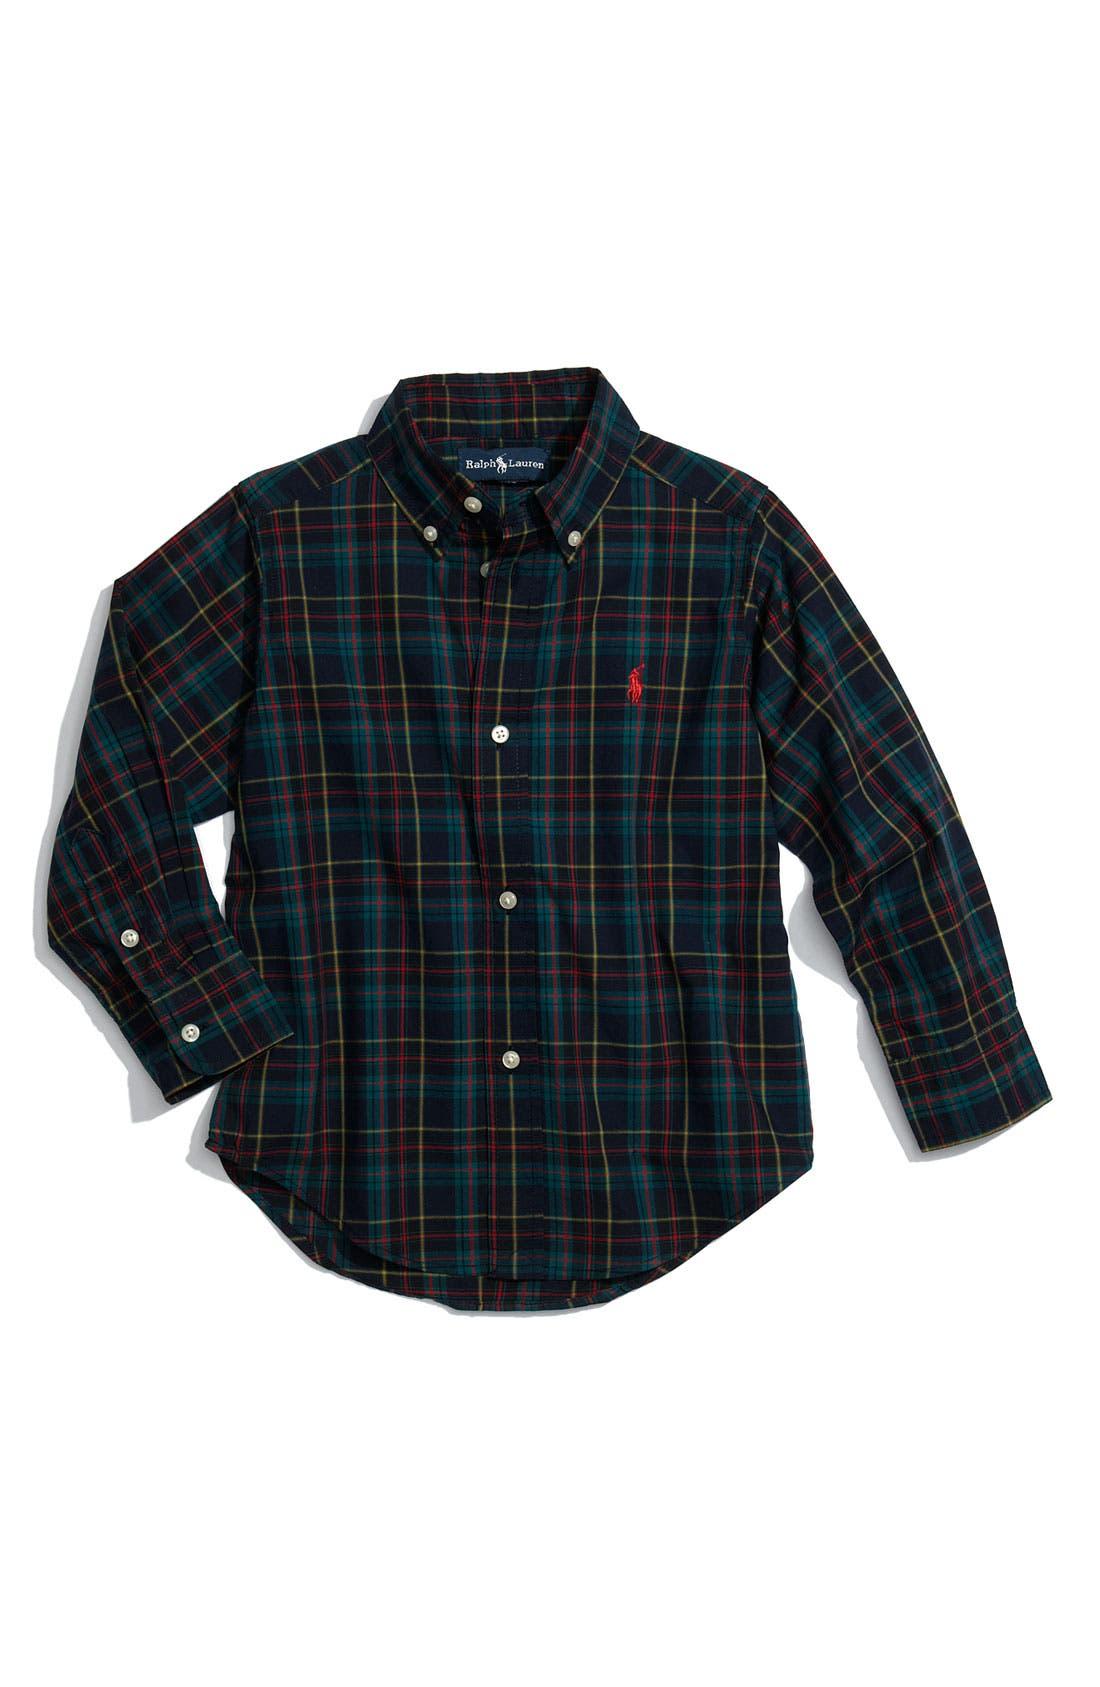 Alternate Image 1 Selected - Ralph Lauren Button Front Shirt (Toddler)